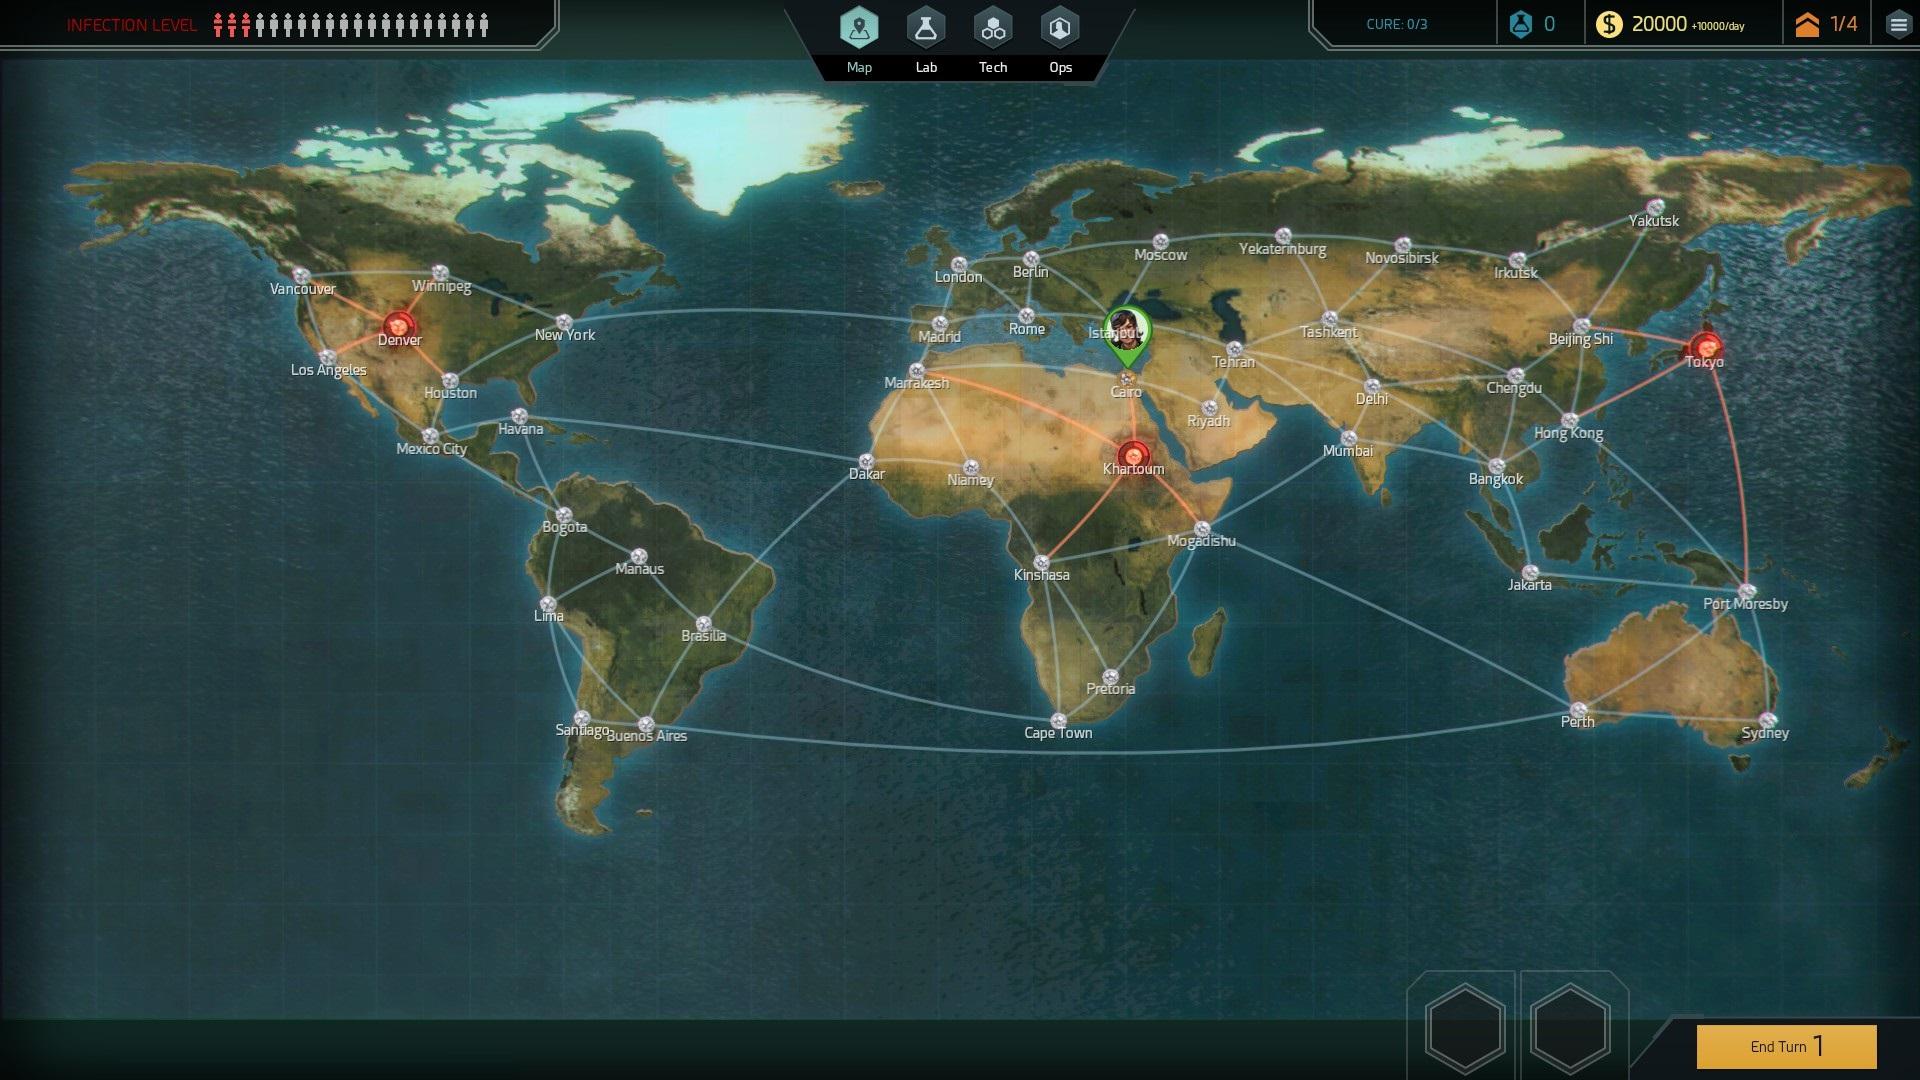 Image result for quarantine game